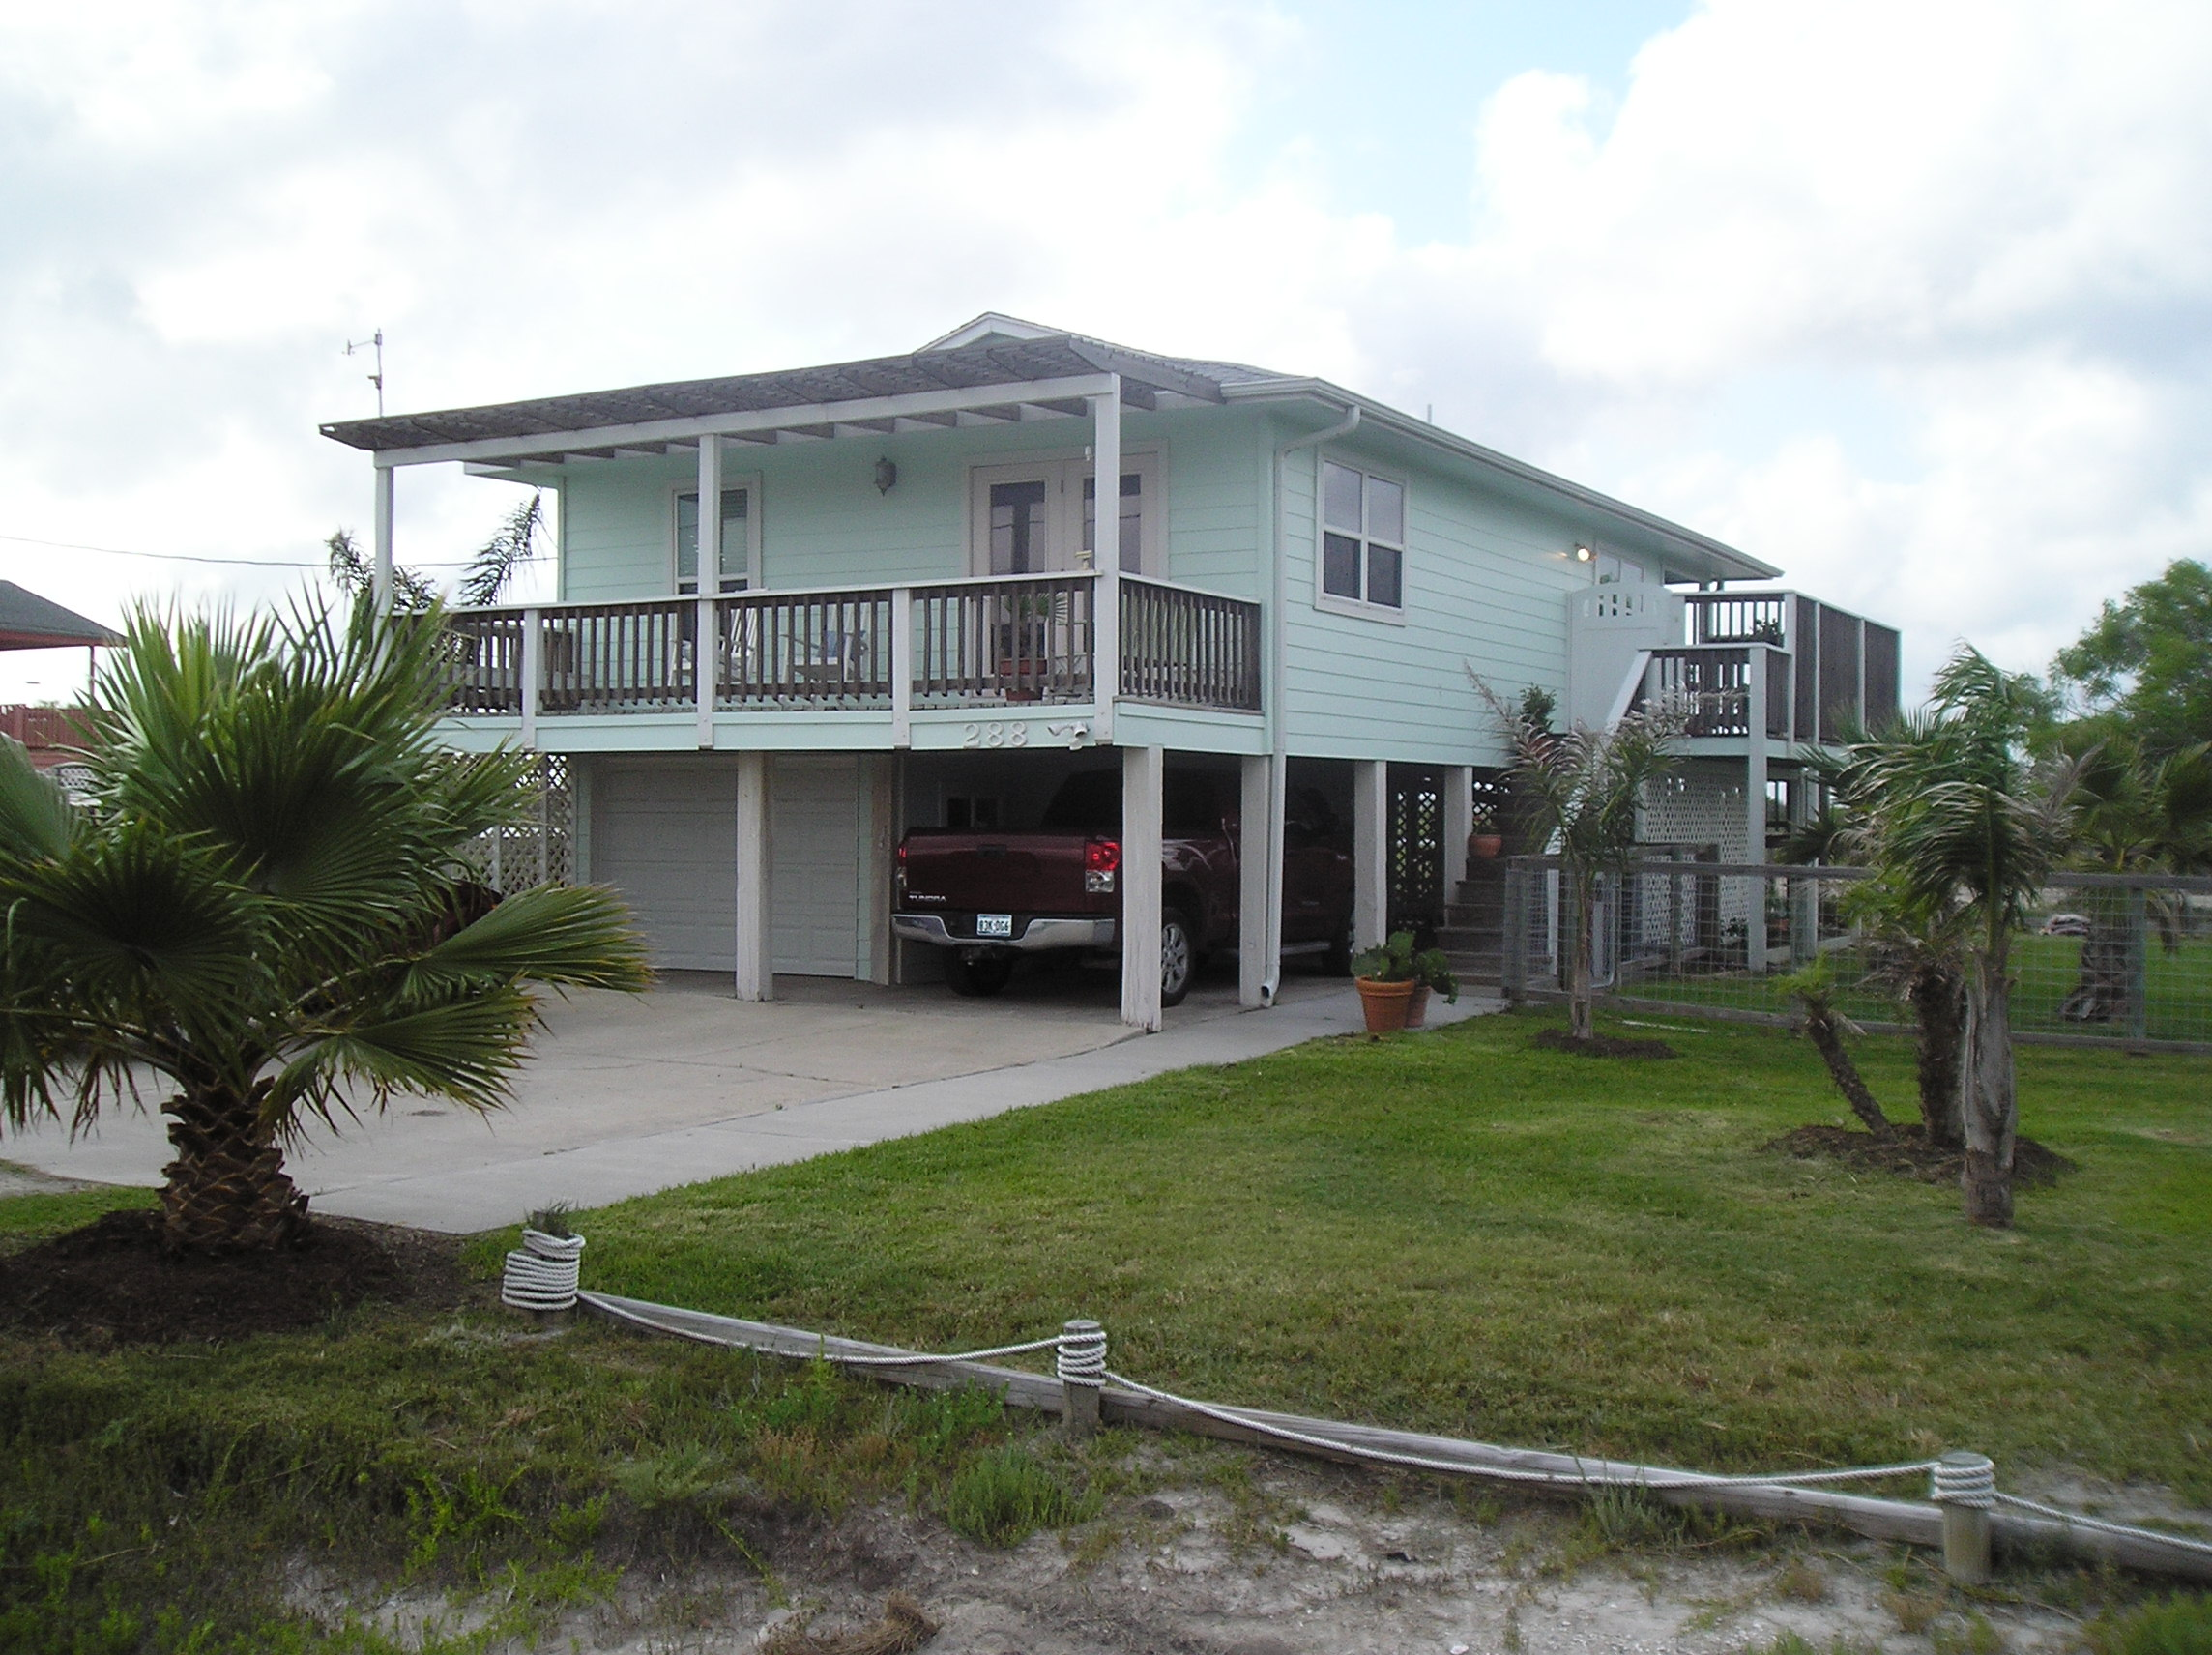 Mortgage rockport texas coastal real estate for Rockport texas real estate waterfront